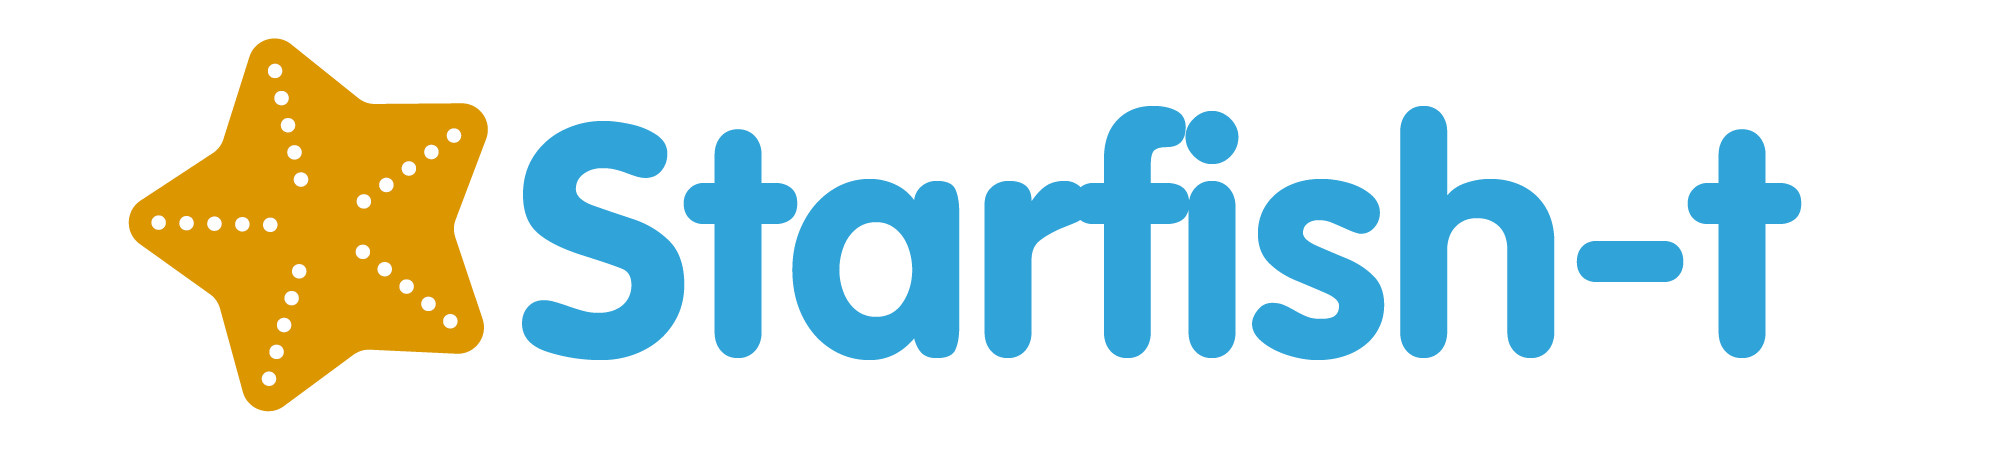 Startfish-T-logo